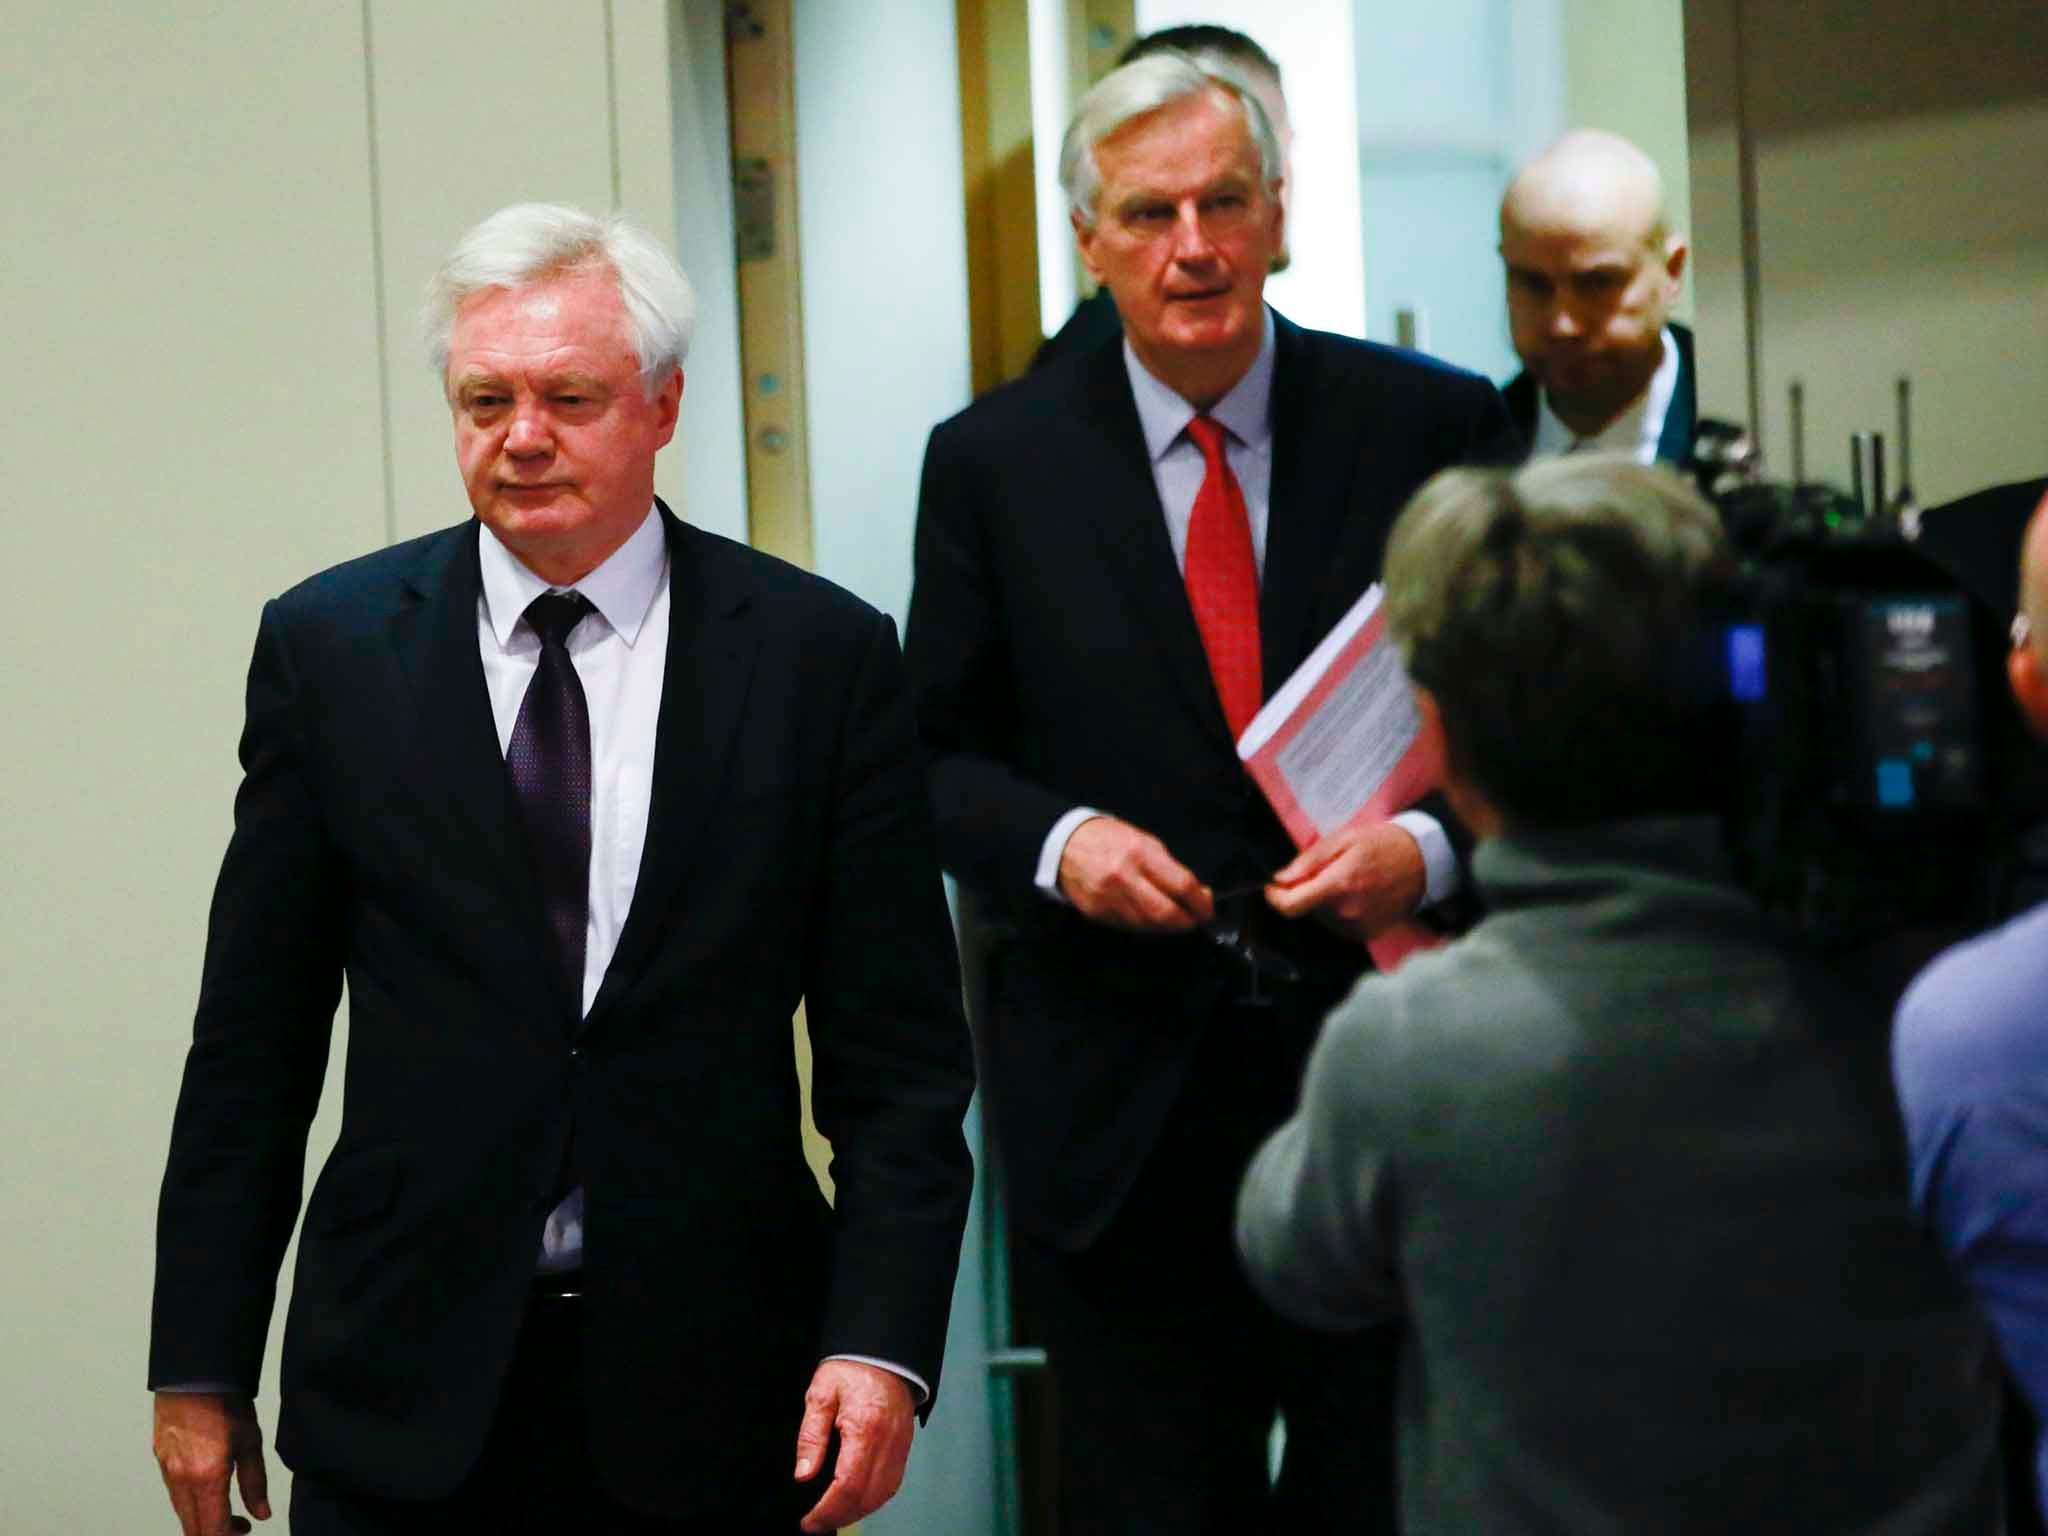 Brexit trade talks could still be months away despite breakthrough